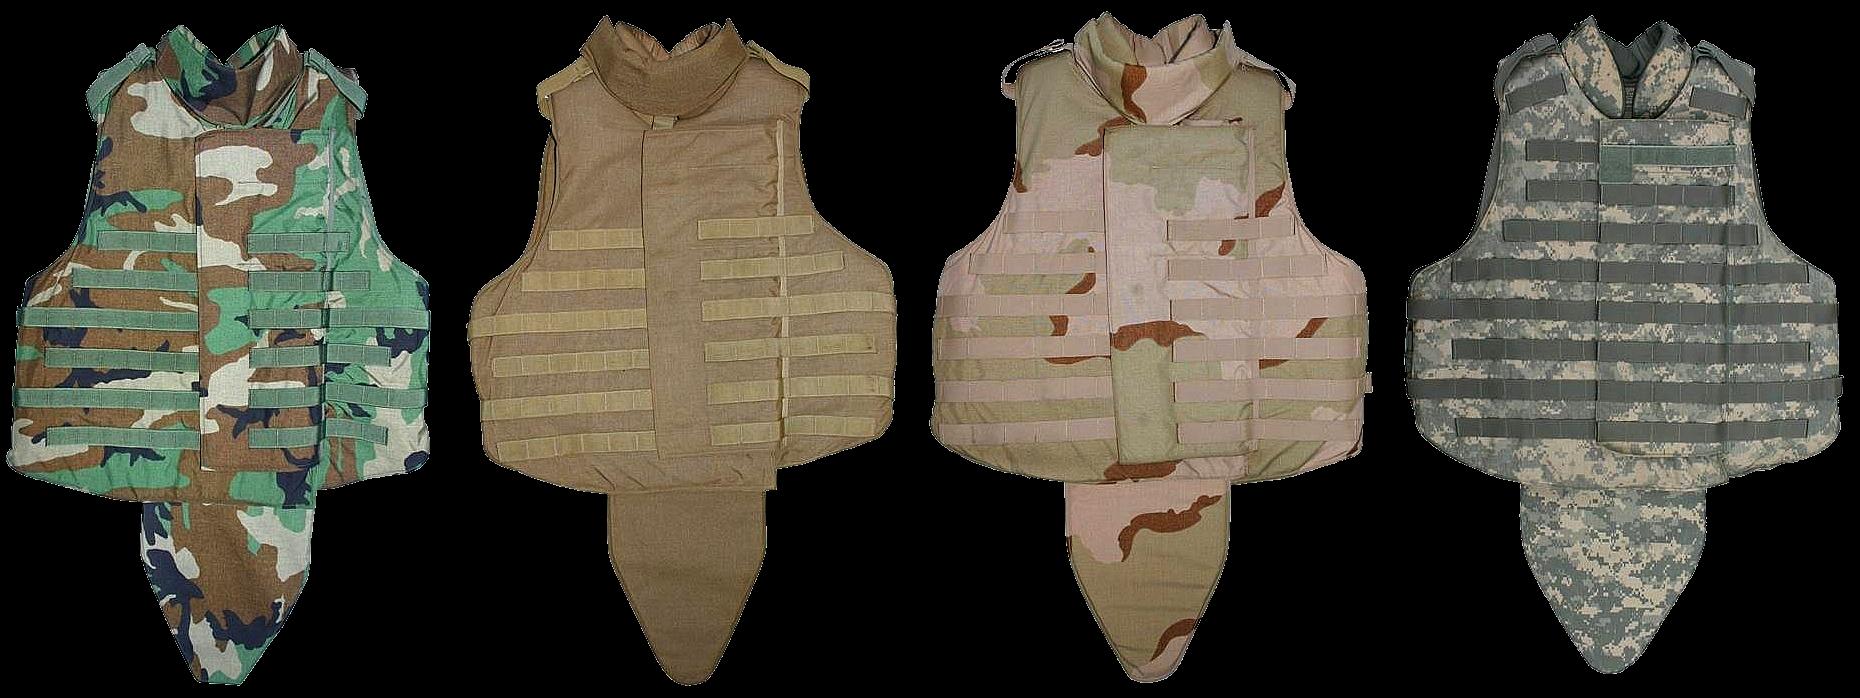 Dog Body Armor Body Armor And Fitness